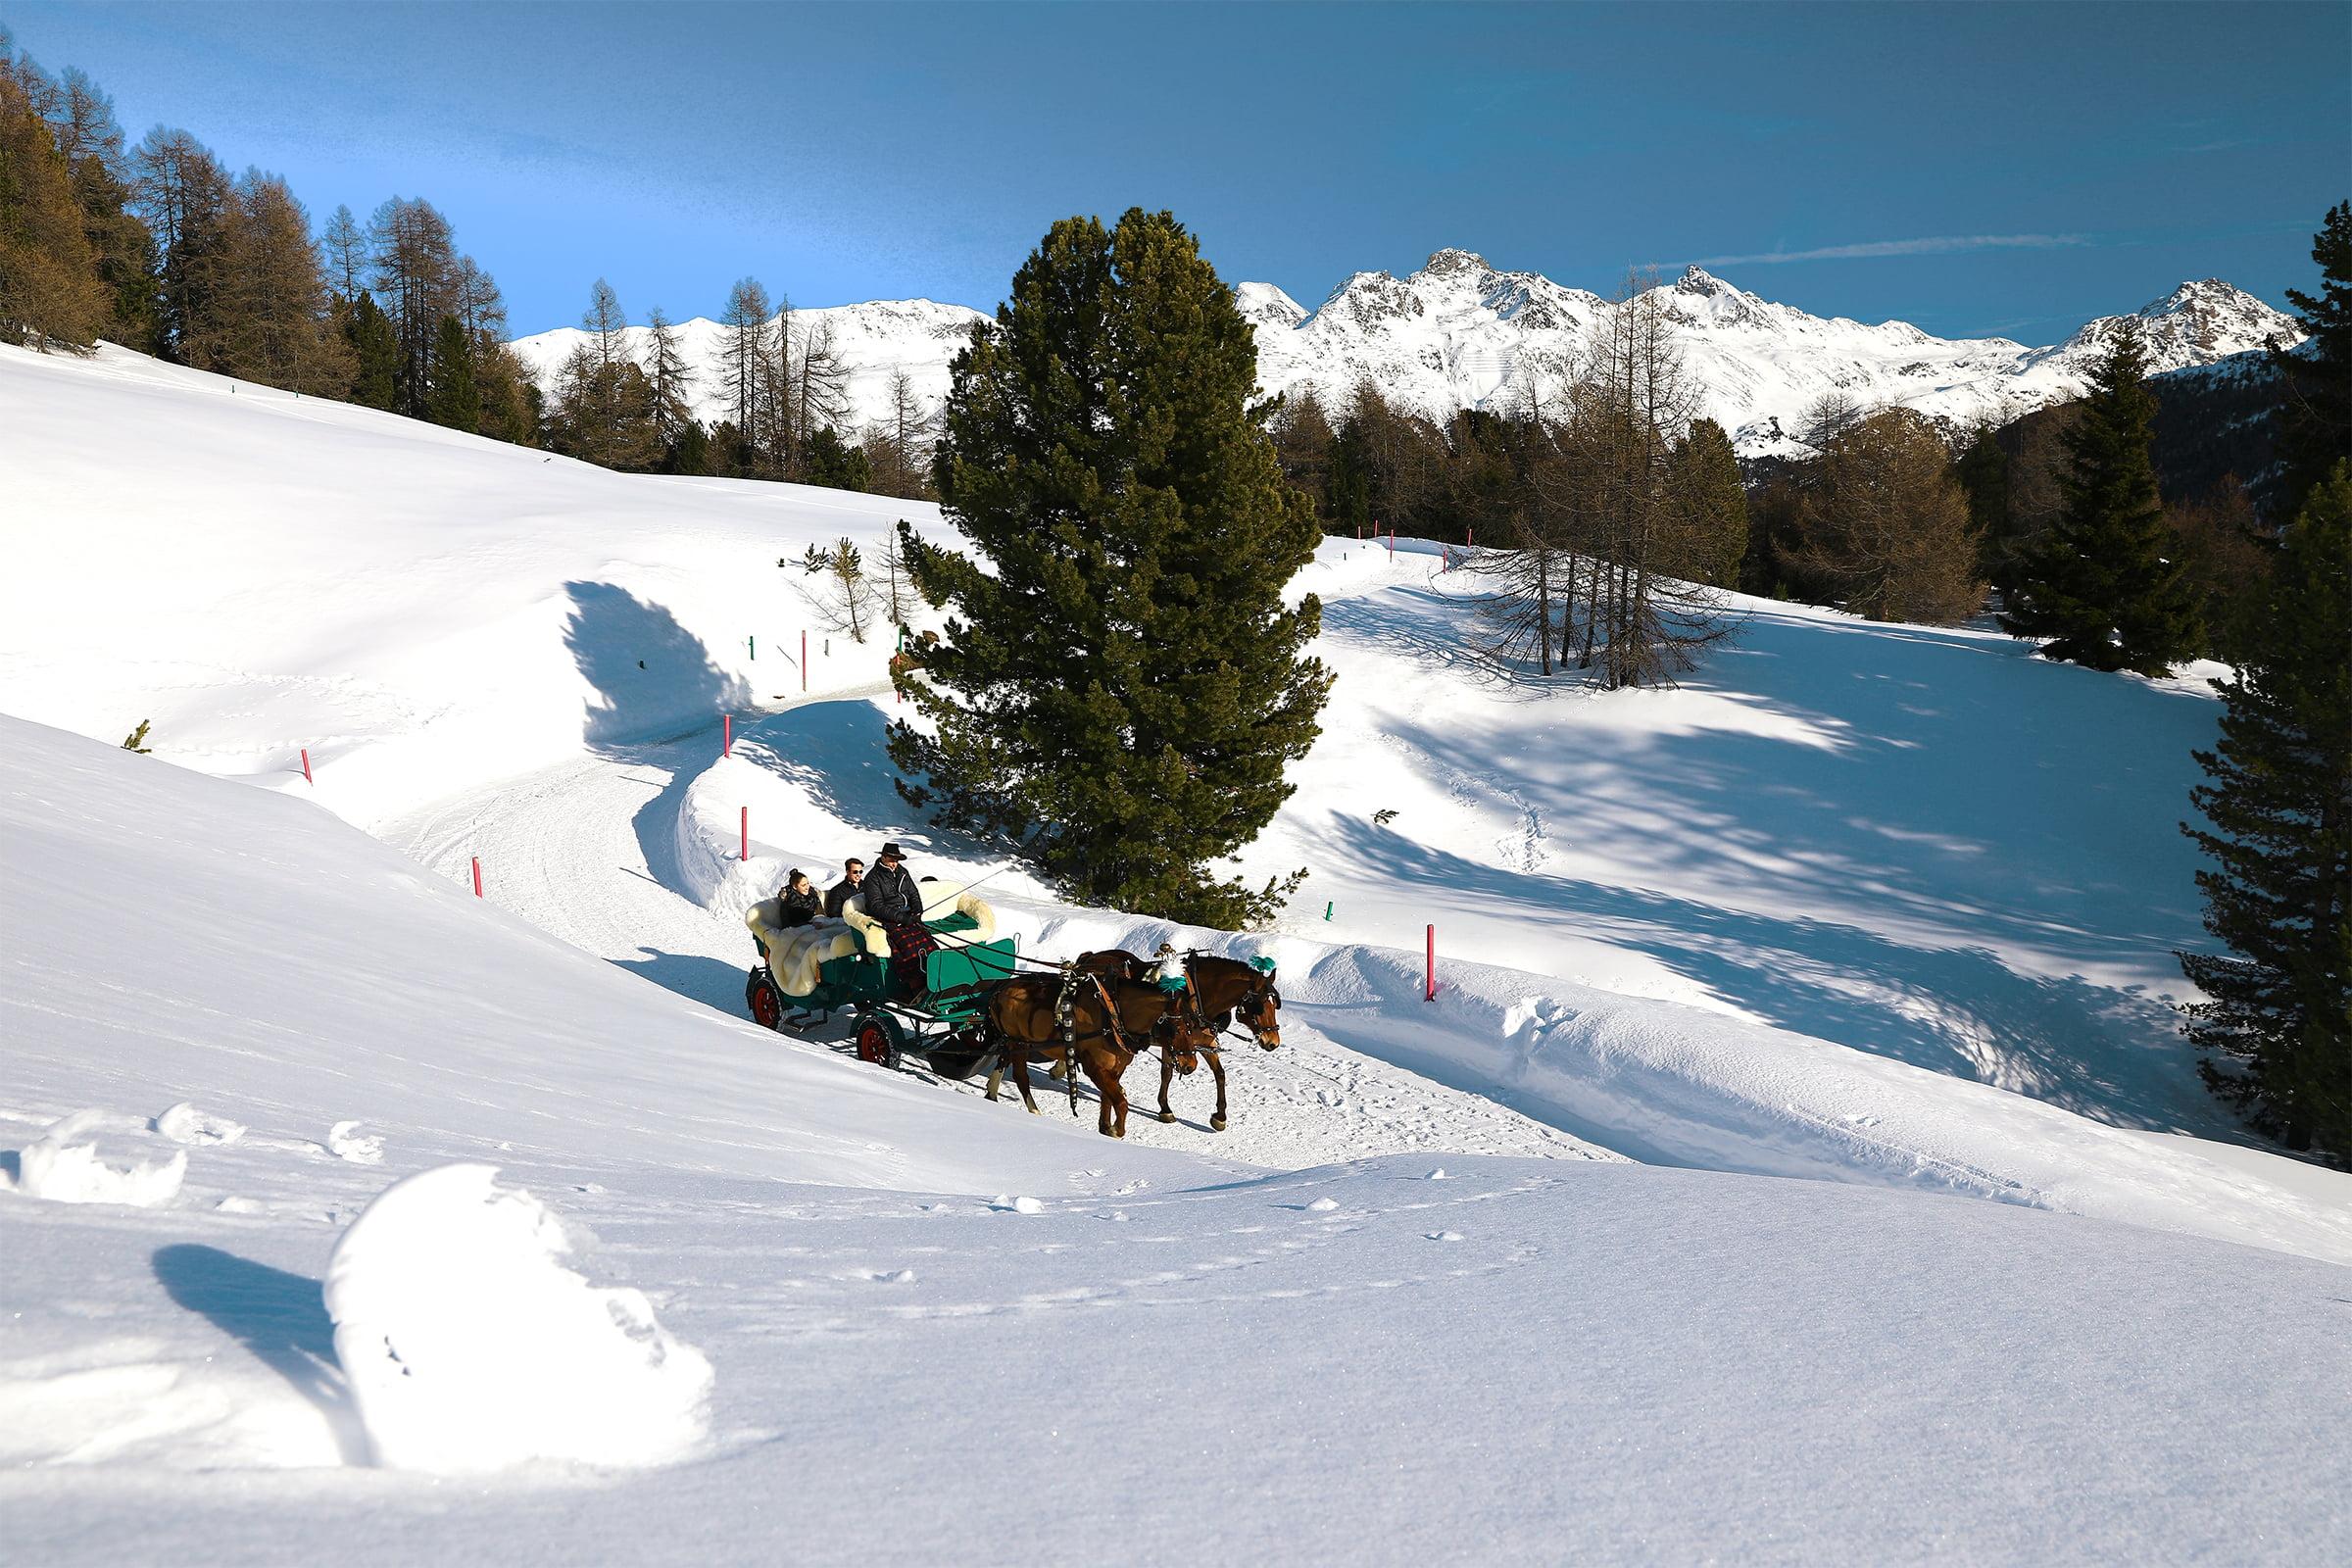 St. Moritz - romantic carriage ride